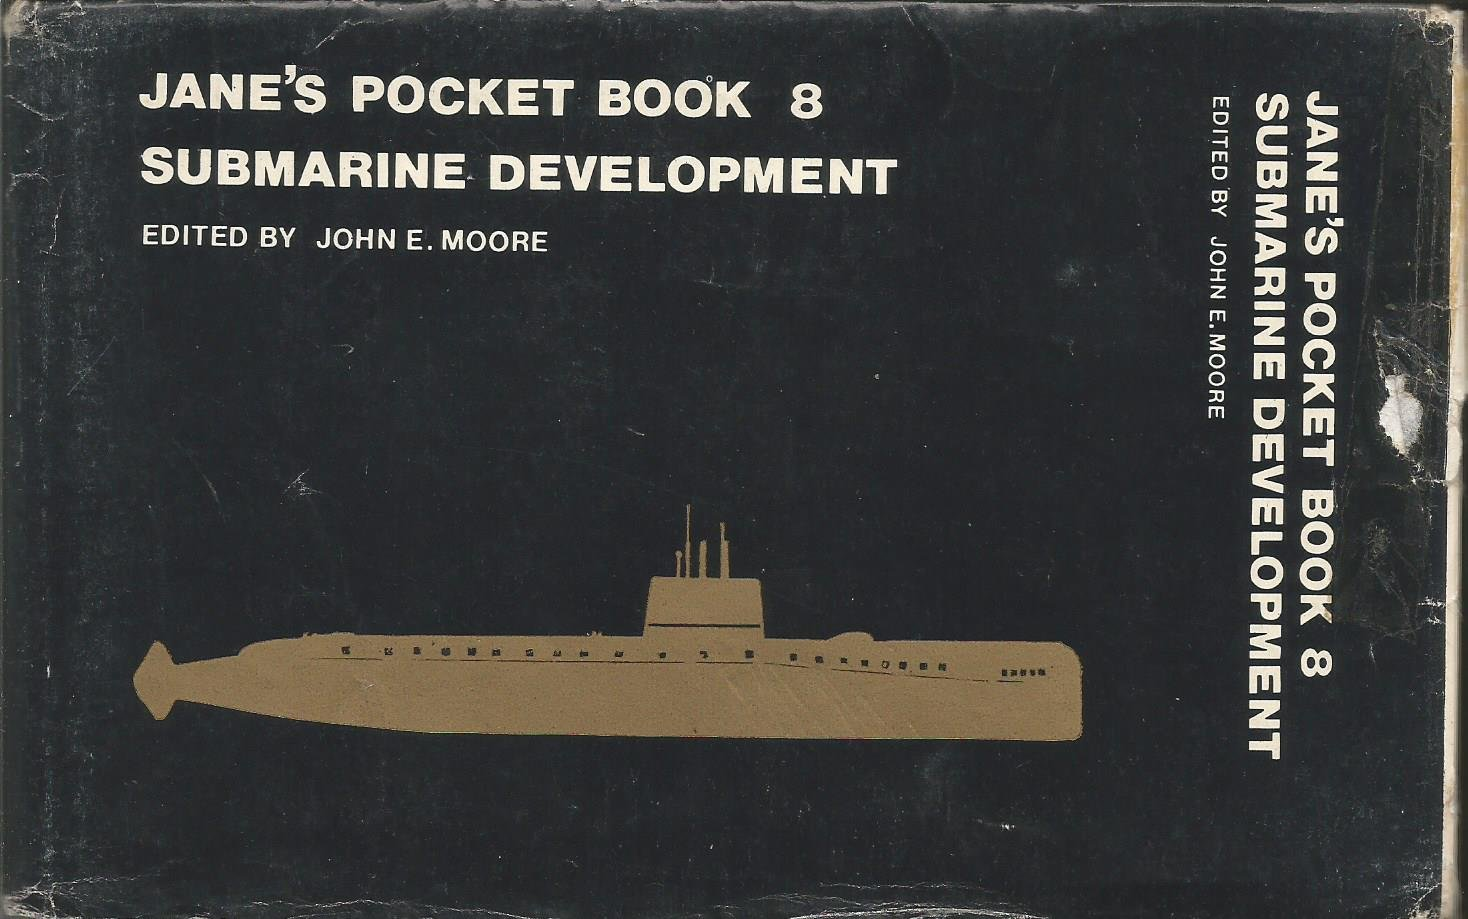 Jane's Pocket Book of Submarine Development (Jane's pocket book ; 8)